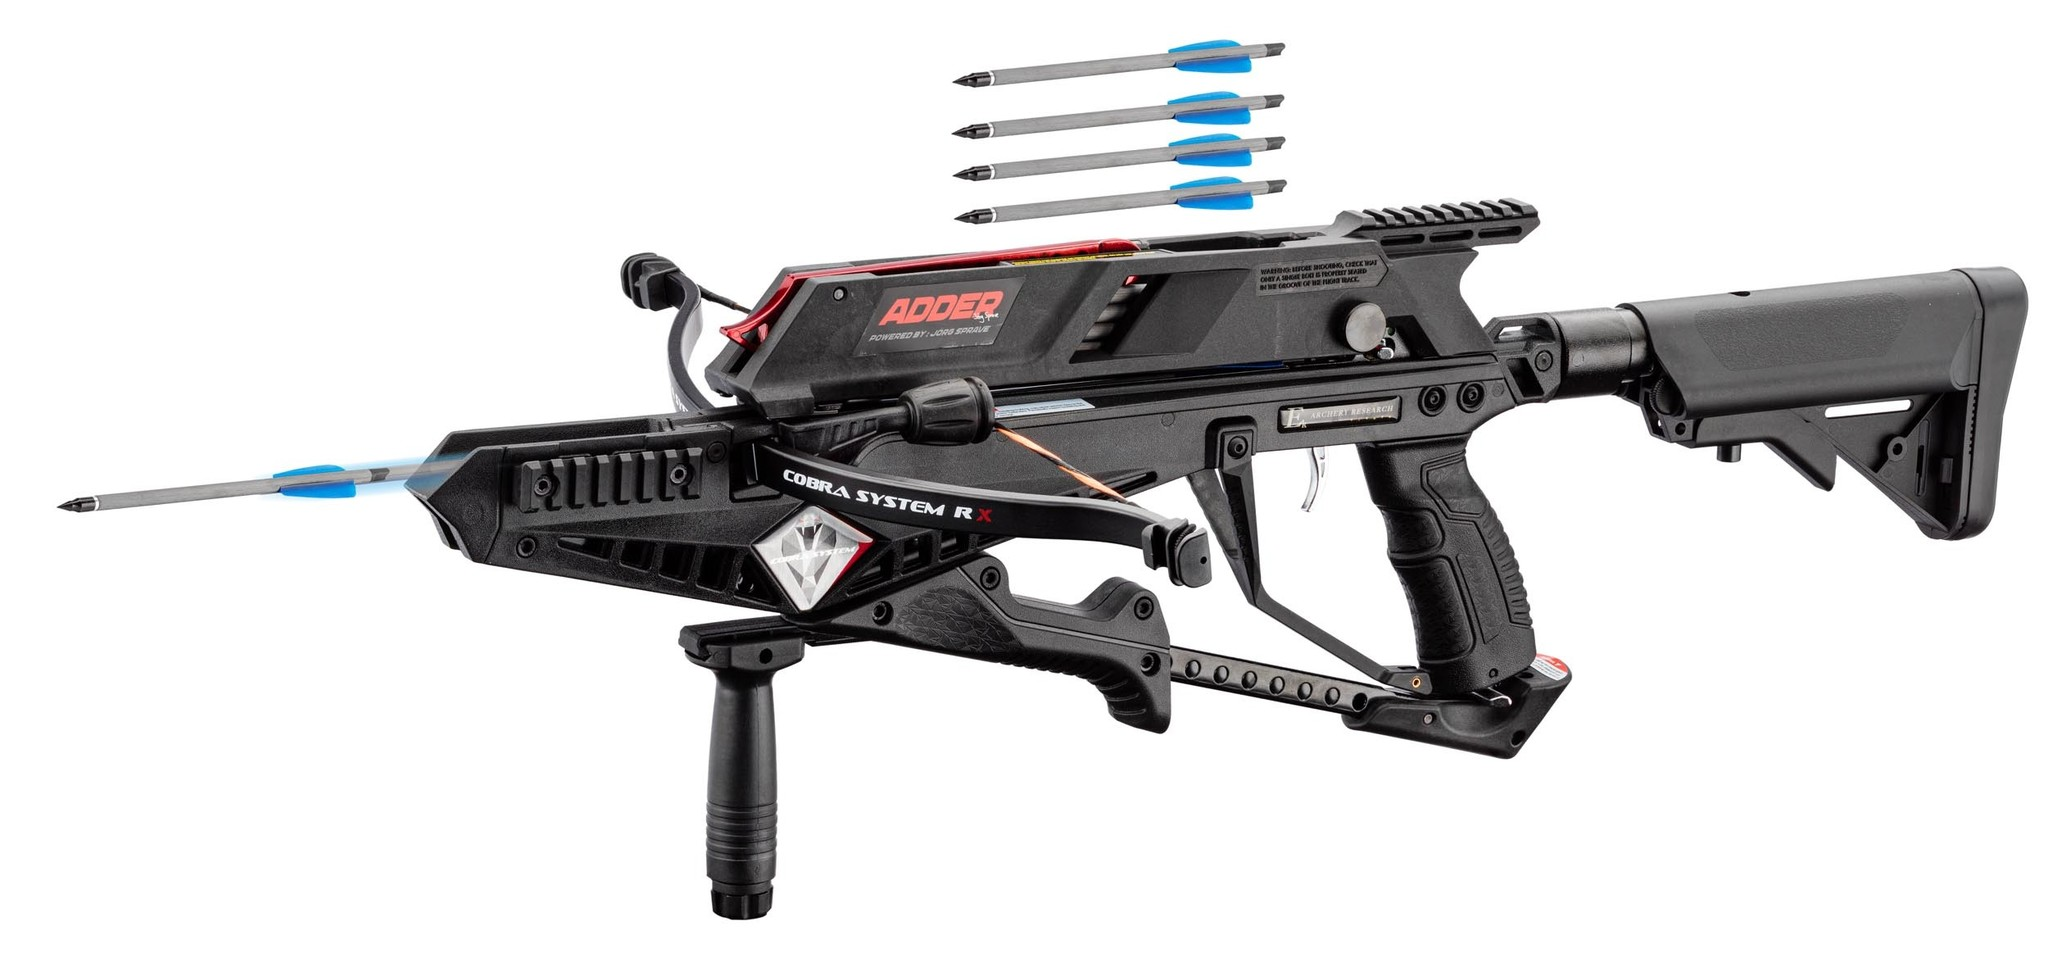 Ek Archery Xbow Cobra R9 Rx Adder